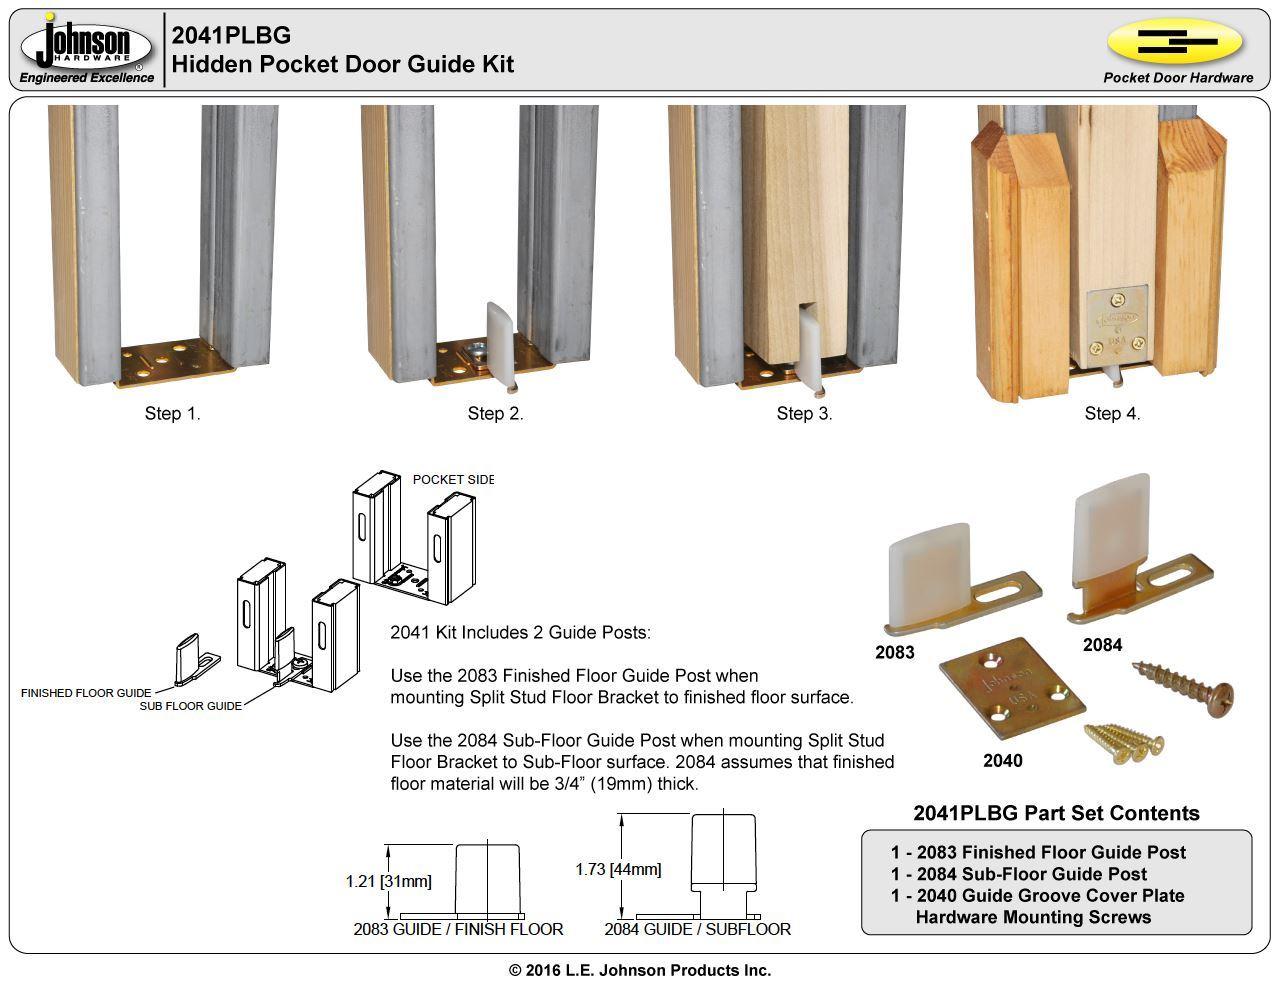 ... Picture of 2041PLBG Hidden Pocket Door Guide Kit  sc 1 st  Jhusa.net & 2041PLBG Hidden Pocket Door Guide Kit | Jhusa.net | Sliding ...